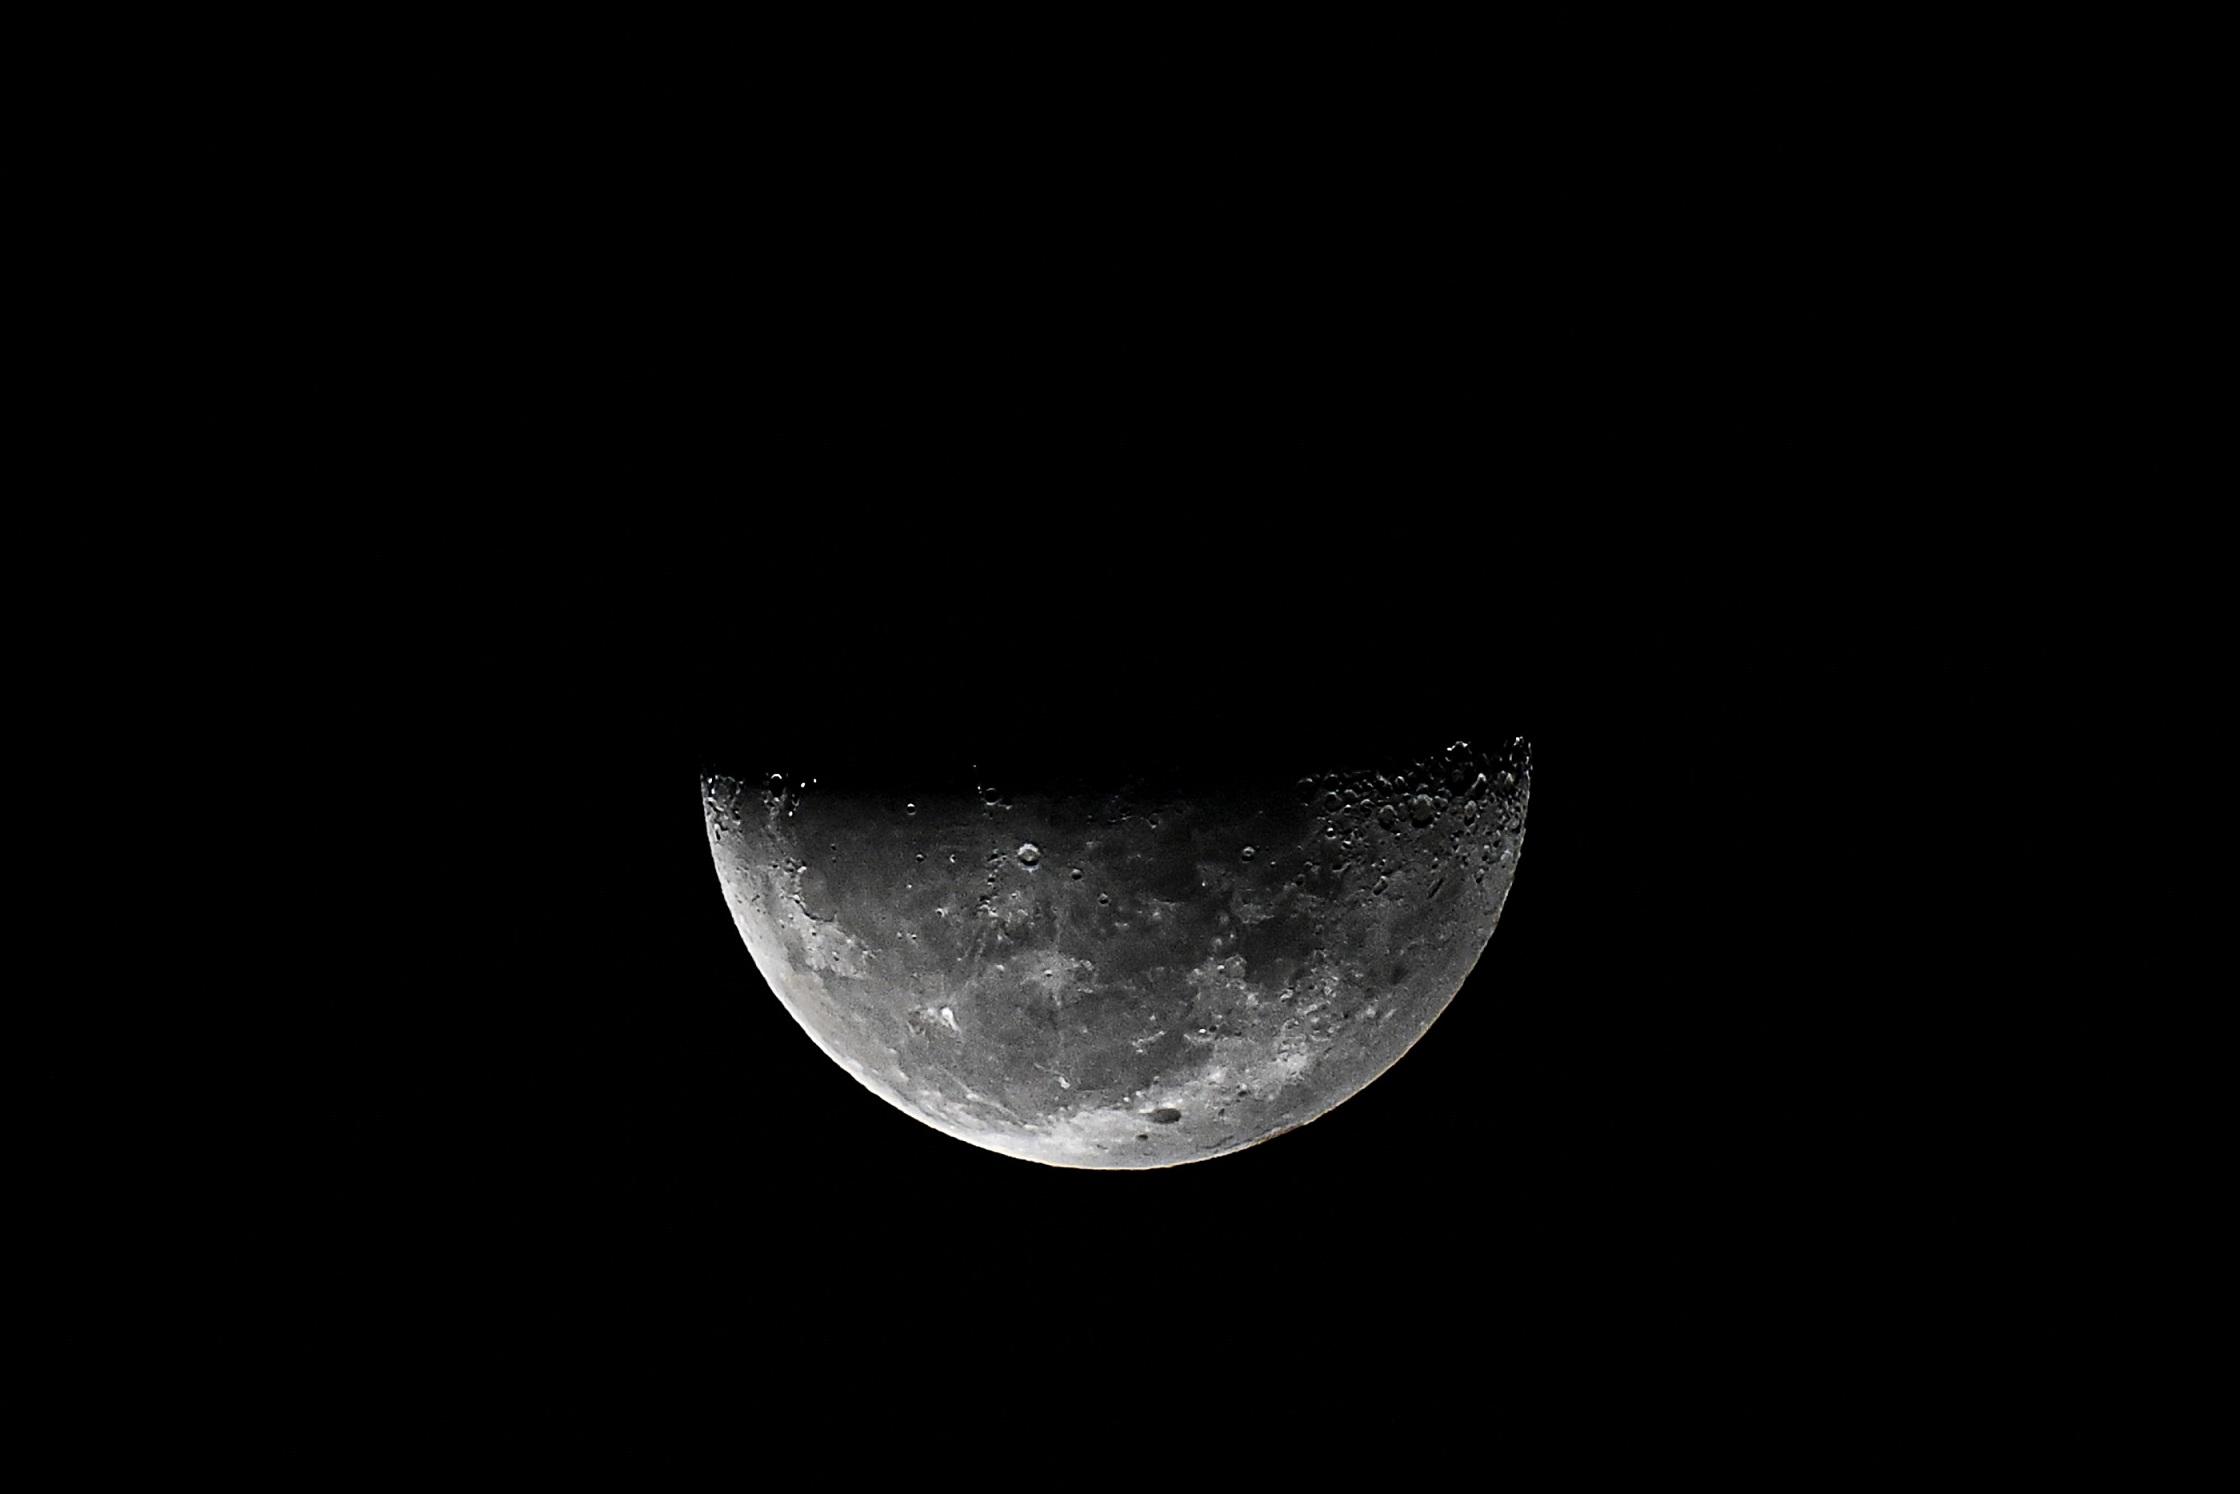 water confirmed on moon